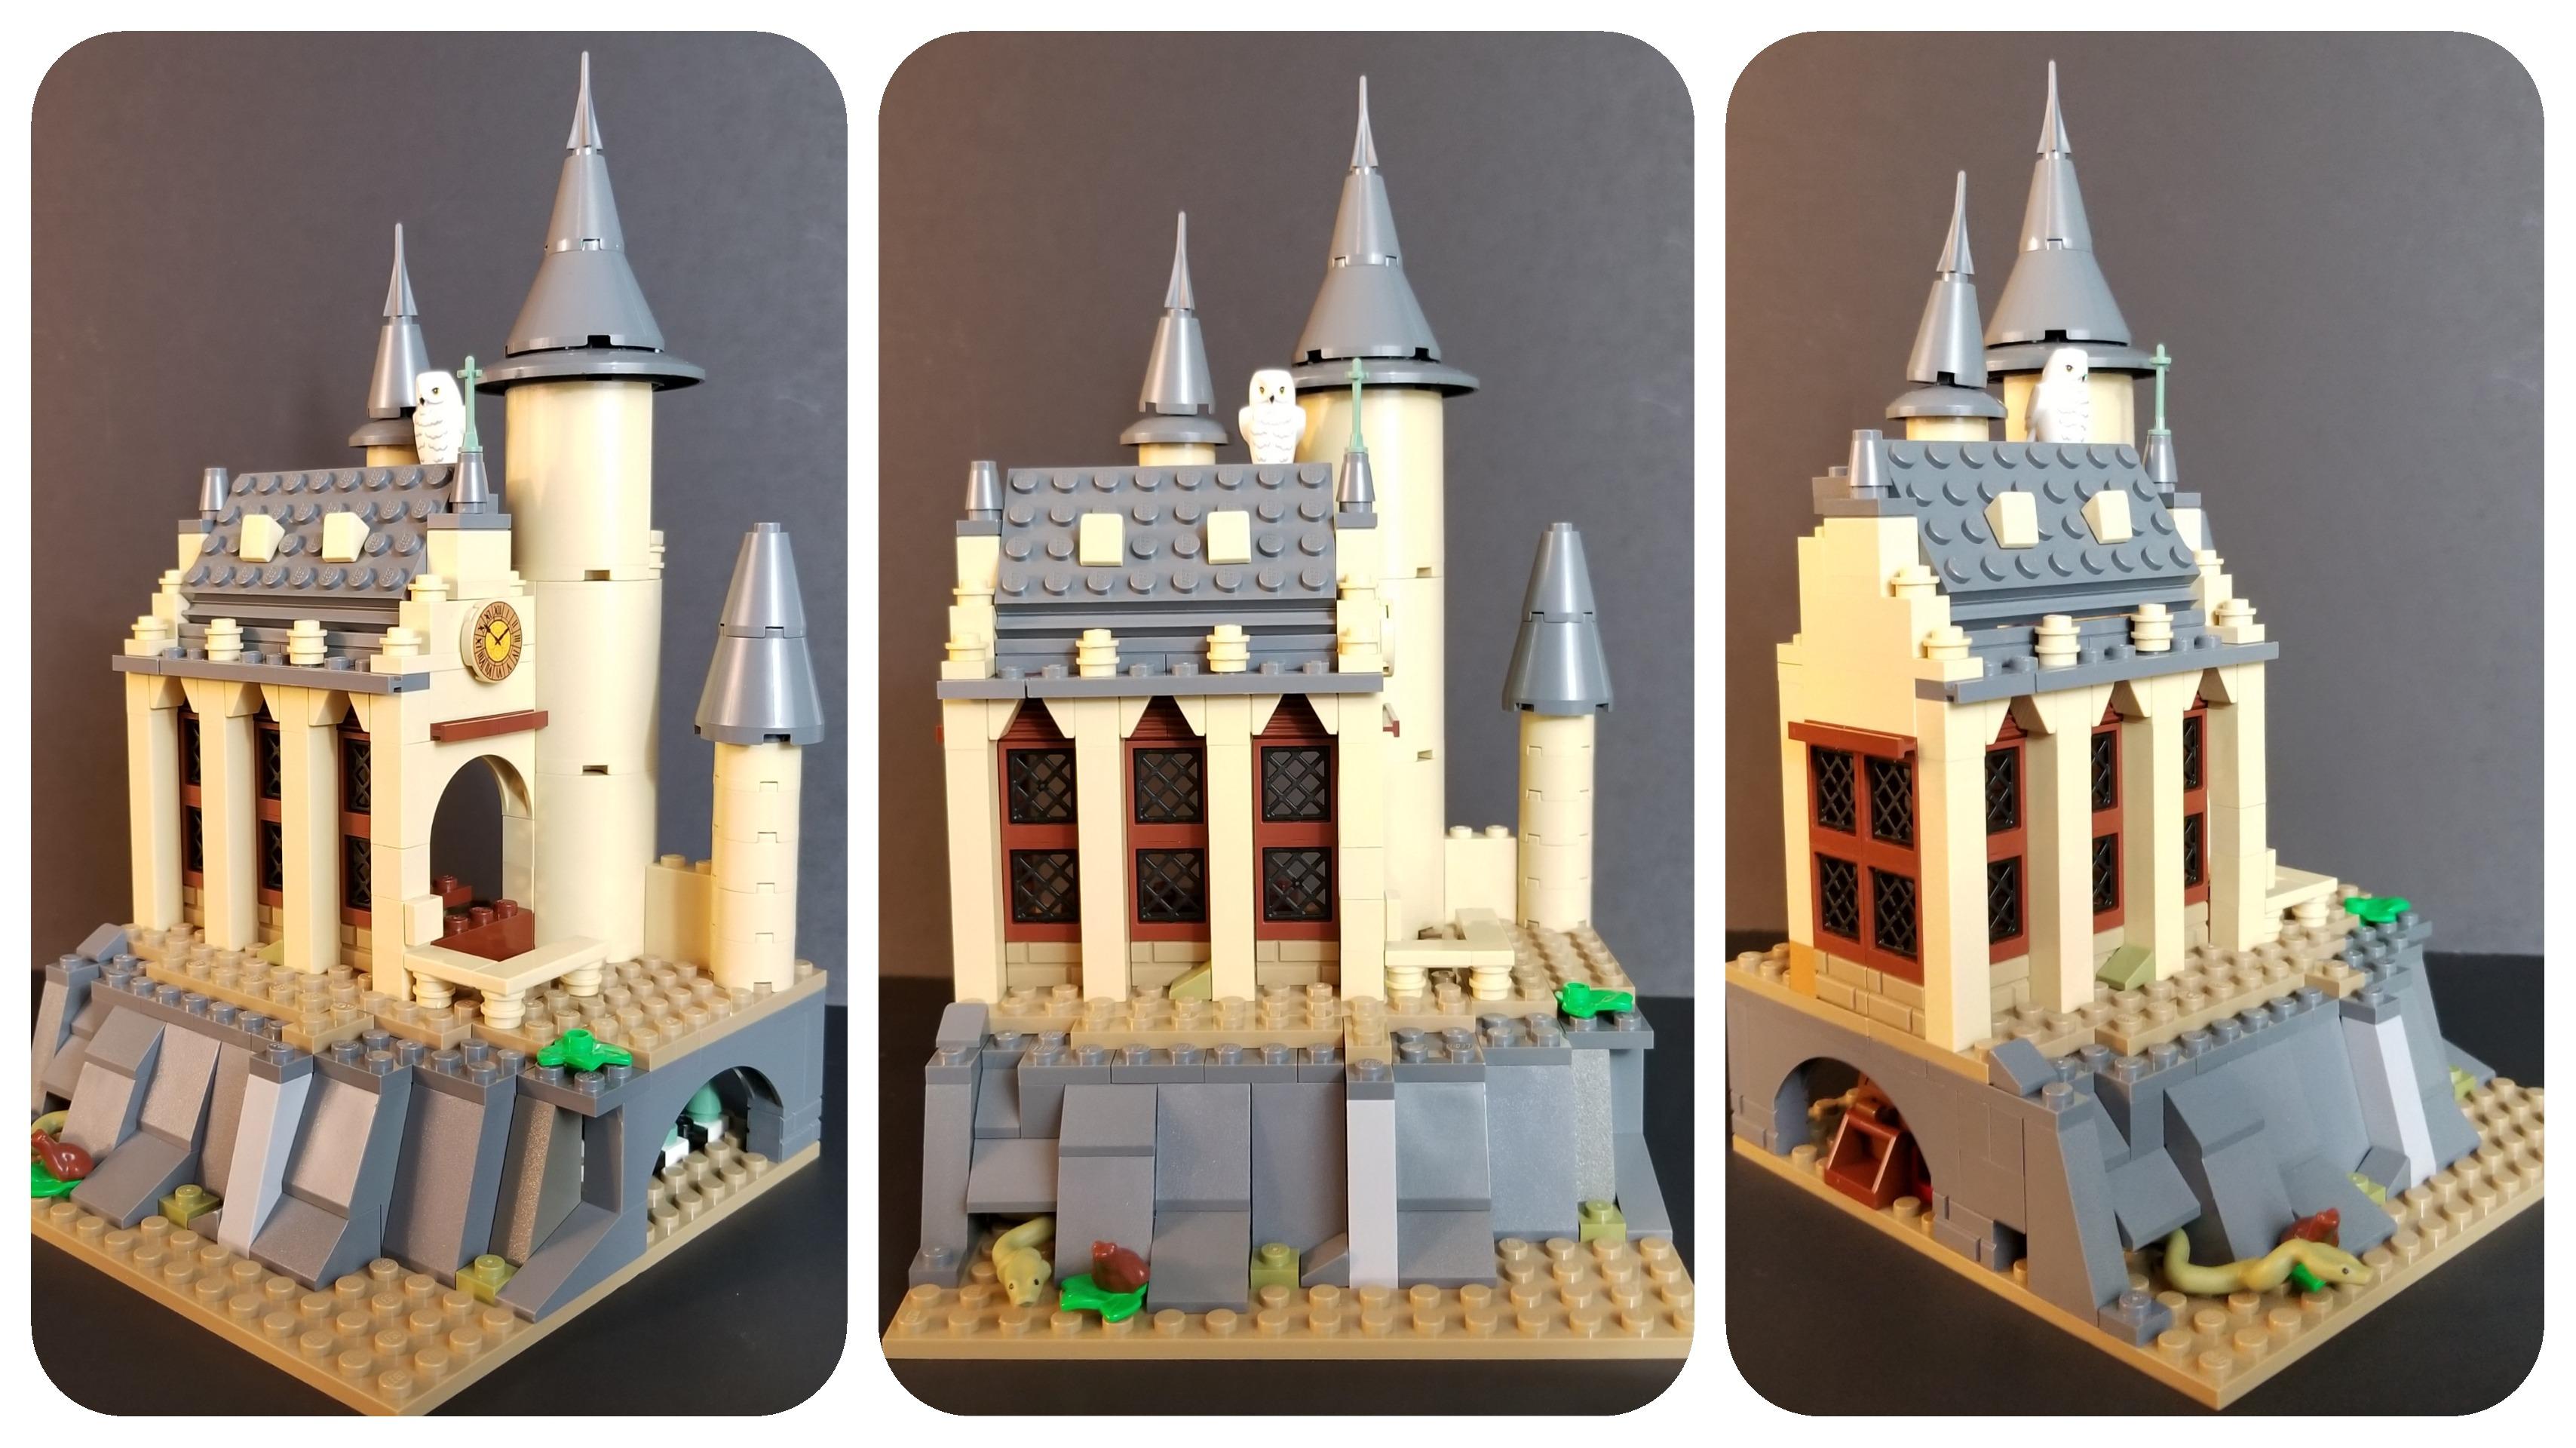 lego hogwarts 16 16 minifigure display castle the farquar. Black Bedroom Furniture Sets. Home Design Ideas